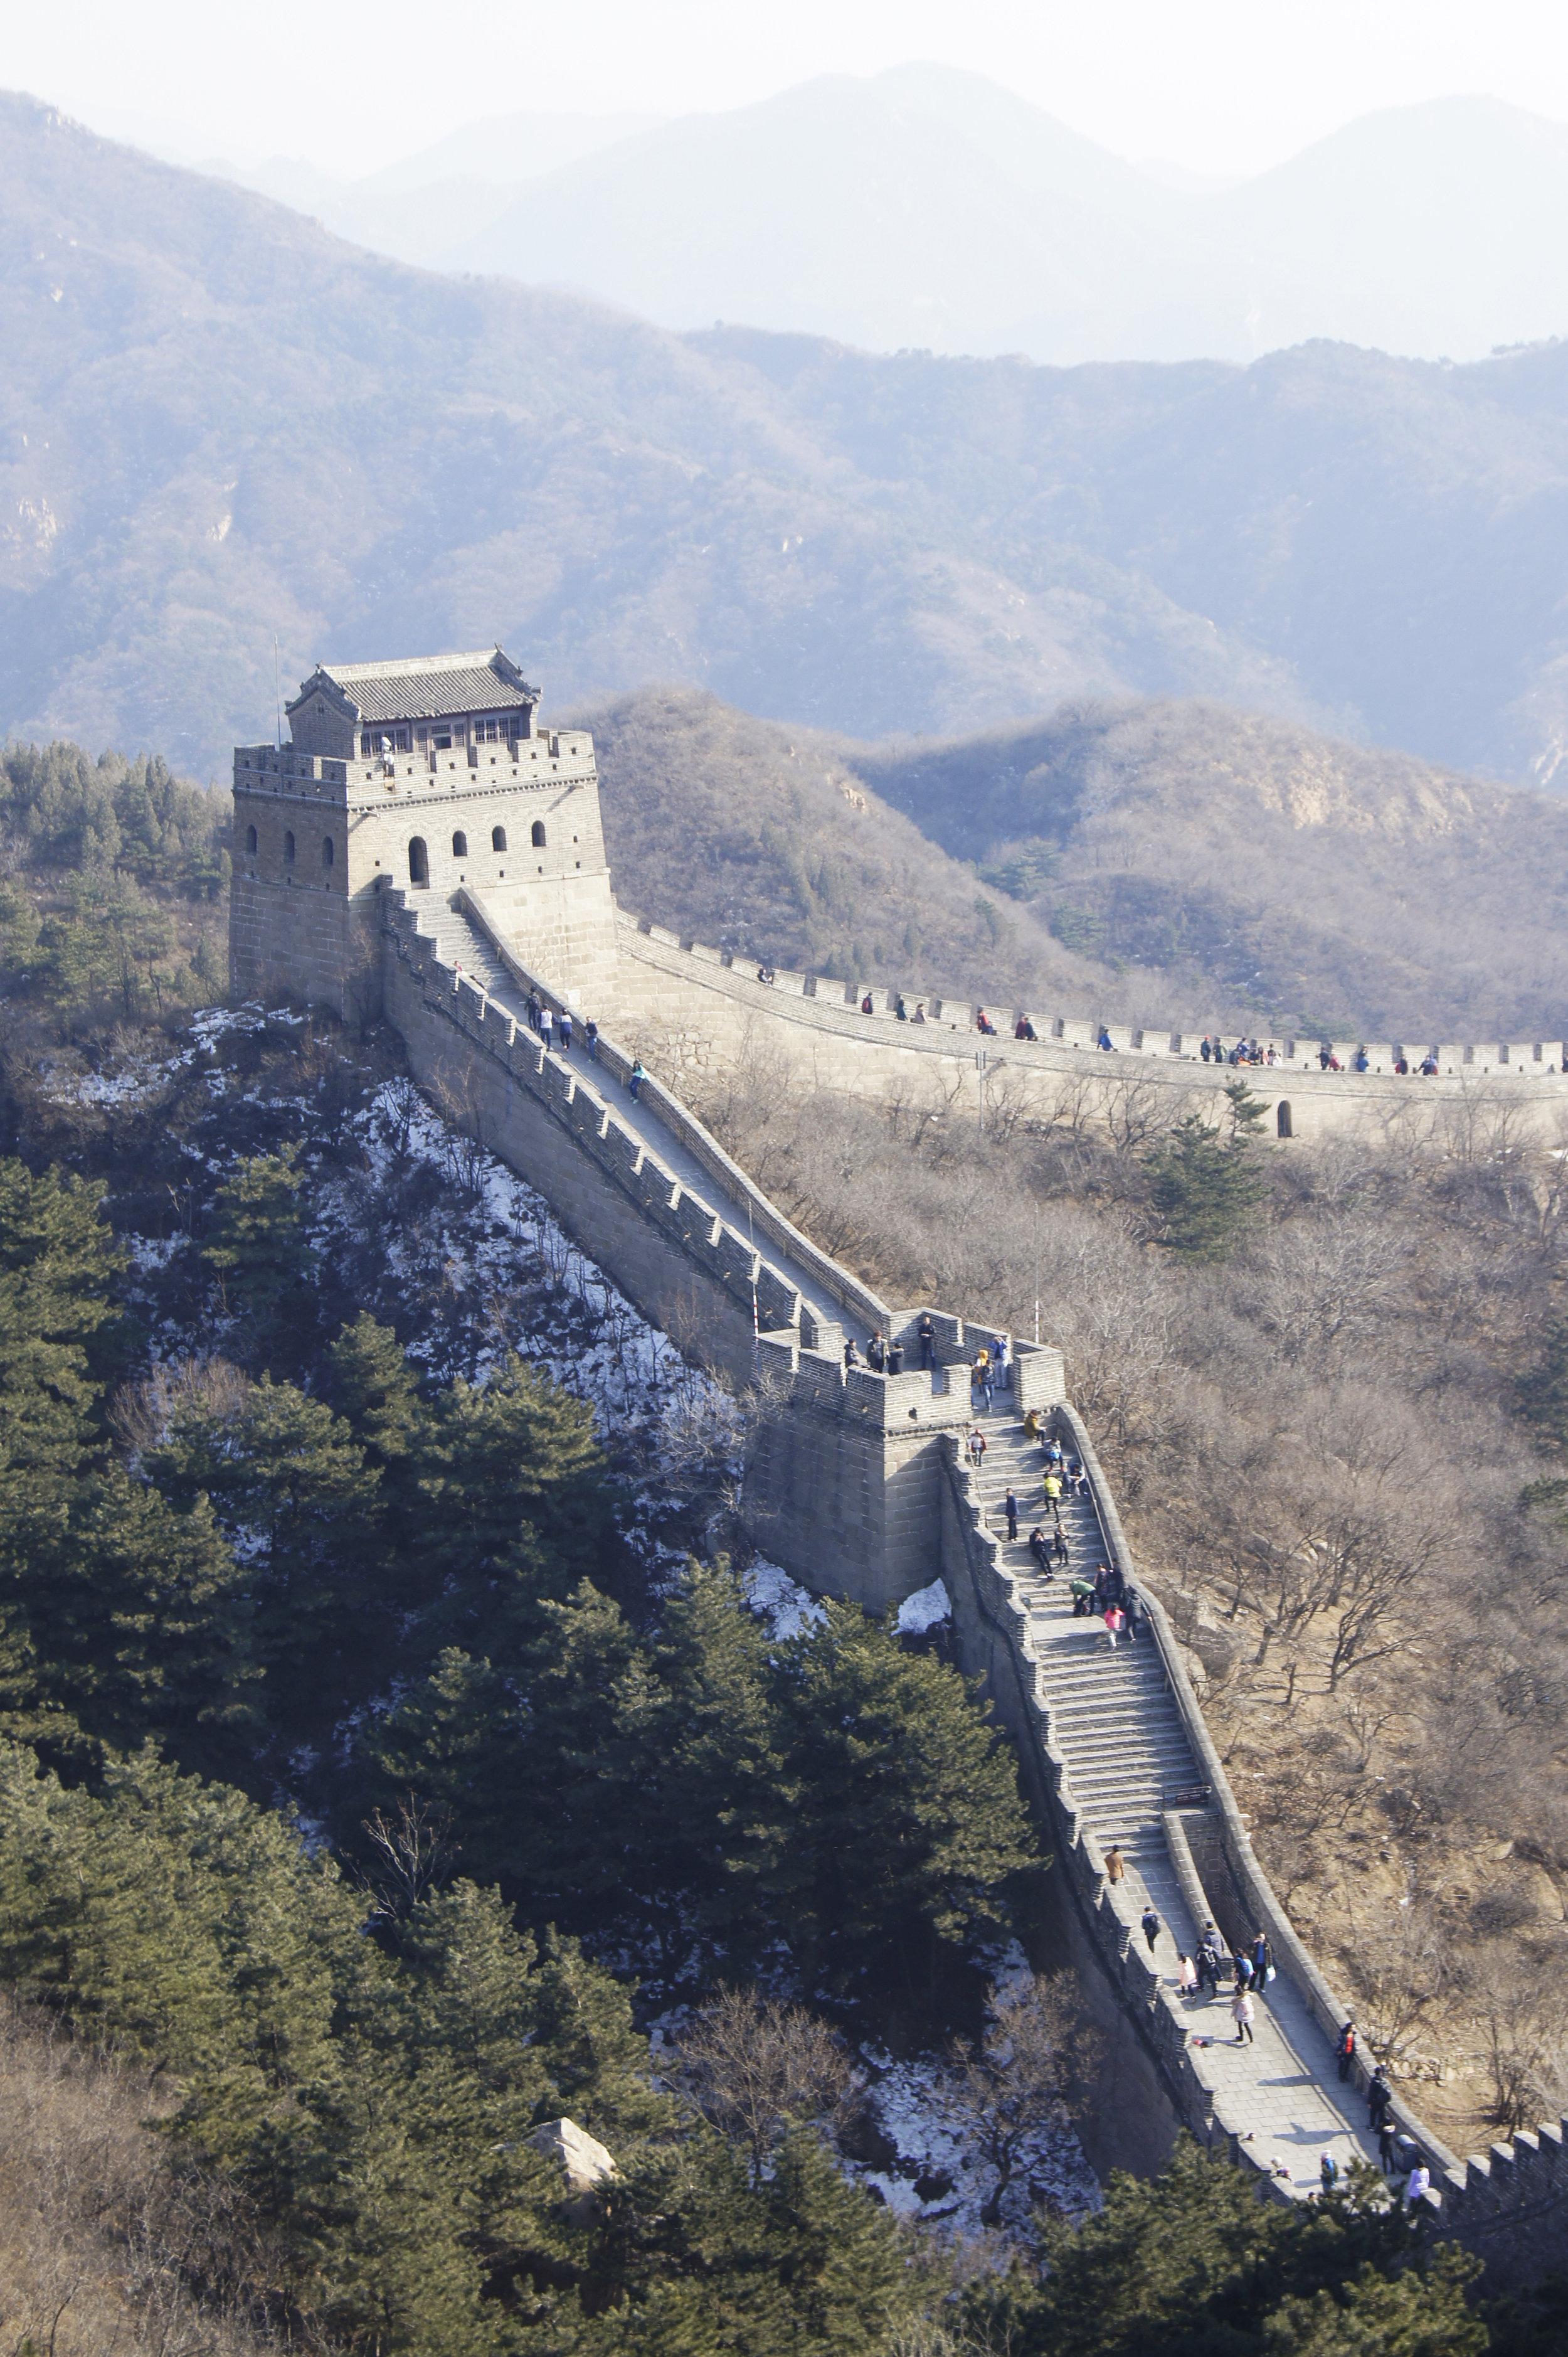 GREAT WALL,BADALING, CHINA                  PHOTOGRAPHY: @HILARYAGUILAR